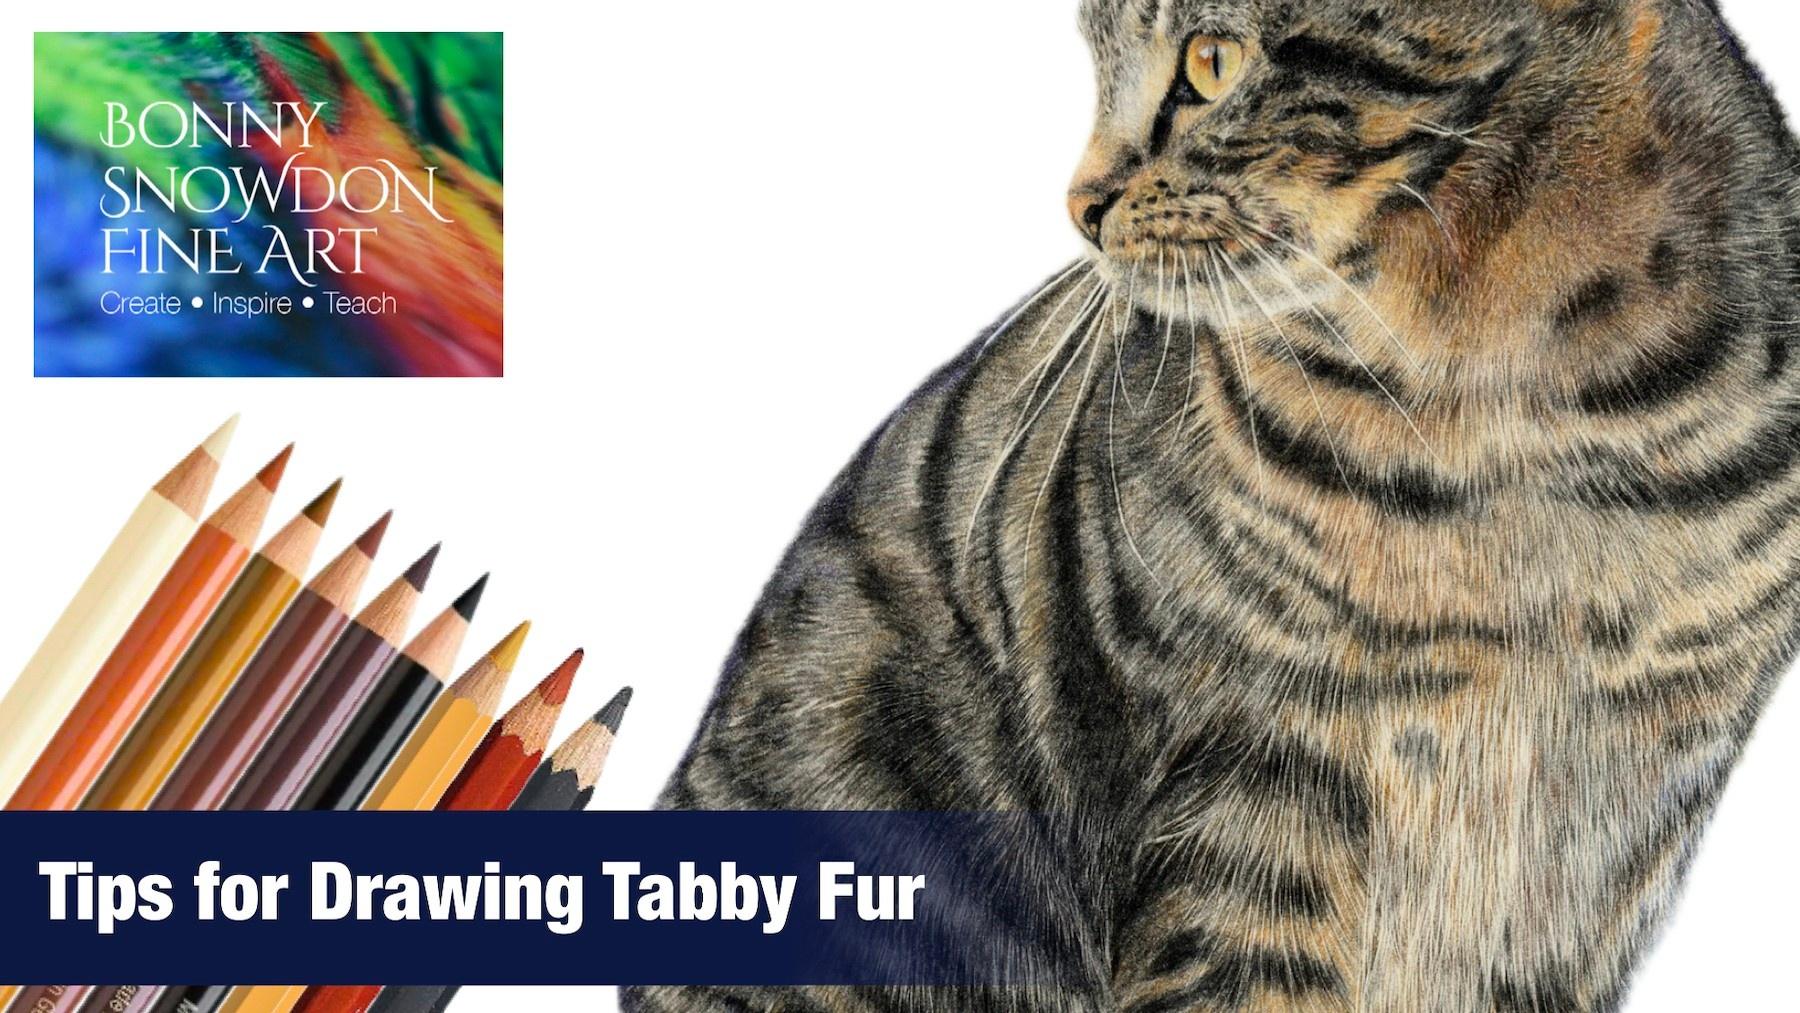 Tips for Drawing Tabby Fur - YouTube - Bonny Snowdon Fine Art